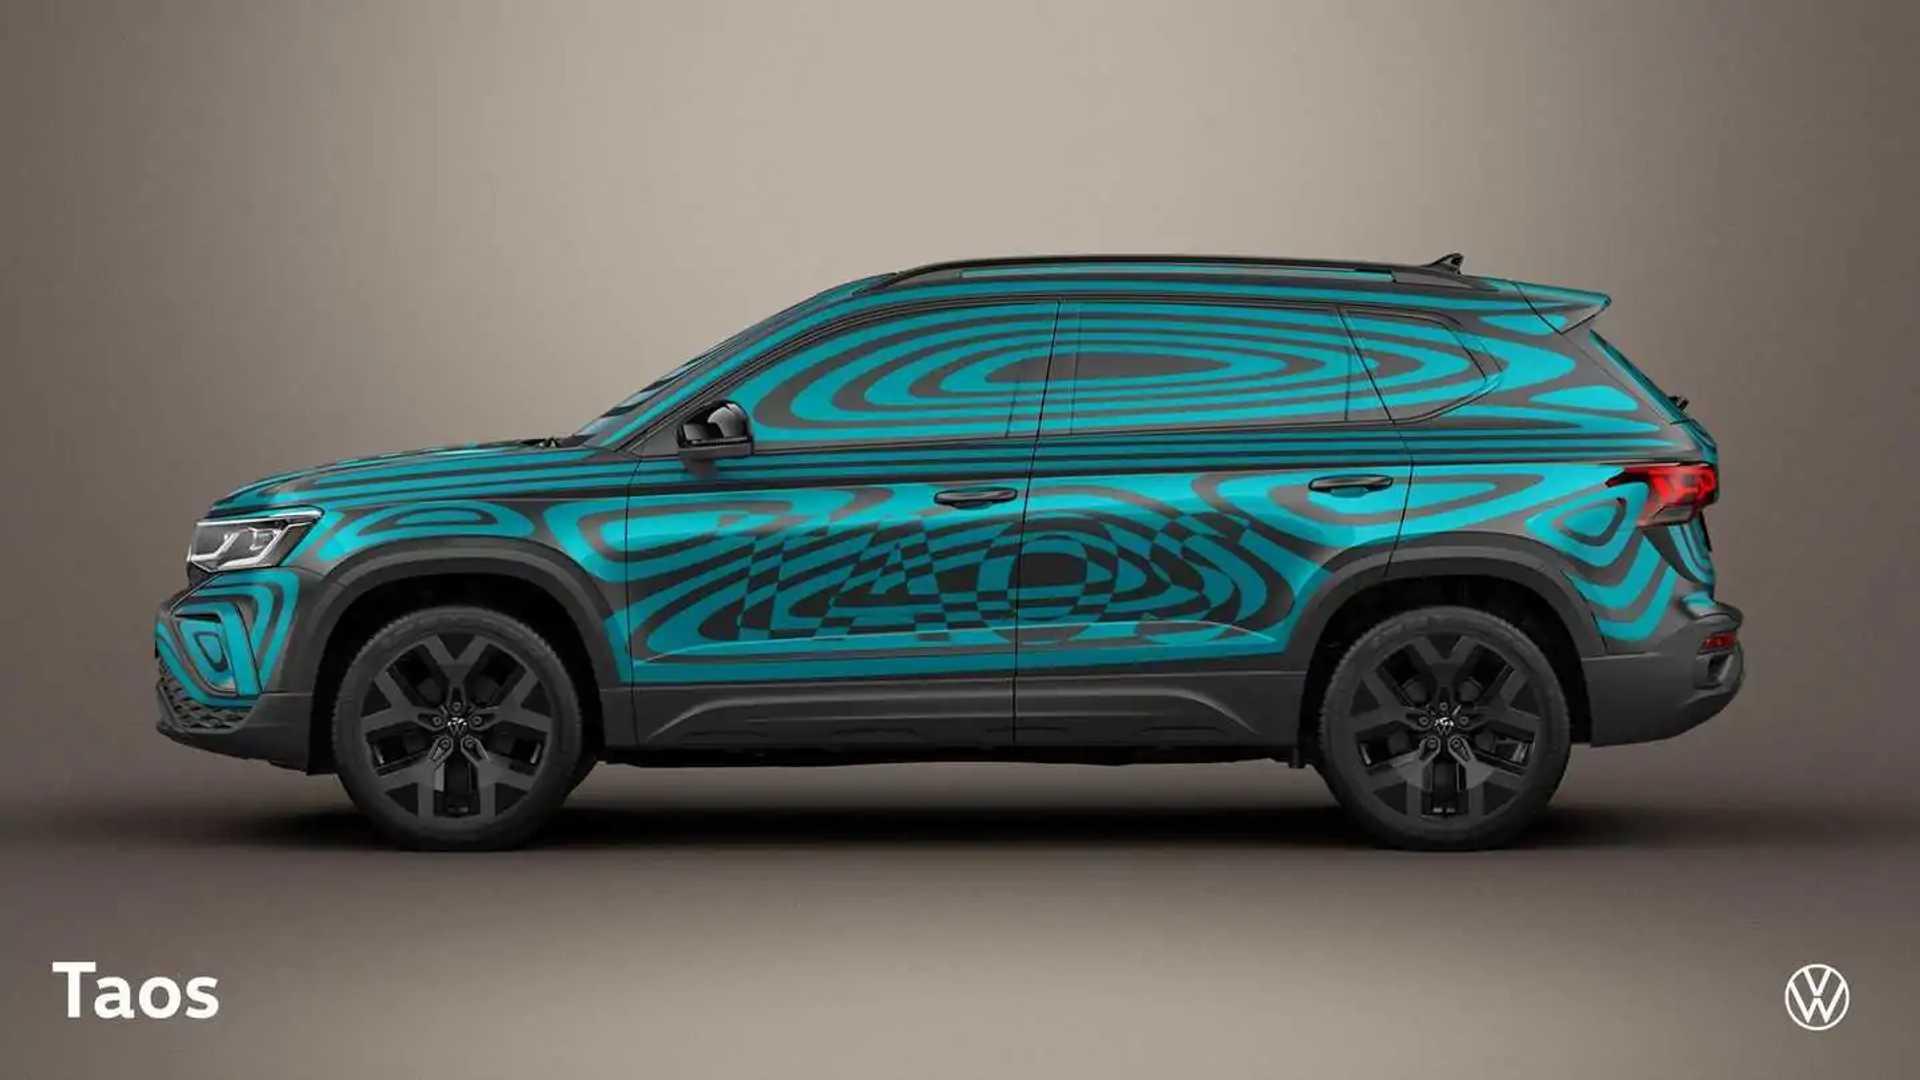 Volkswagen Taos 2022 (Brazil) - Official